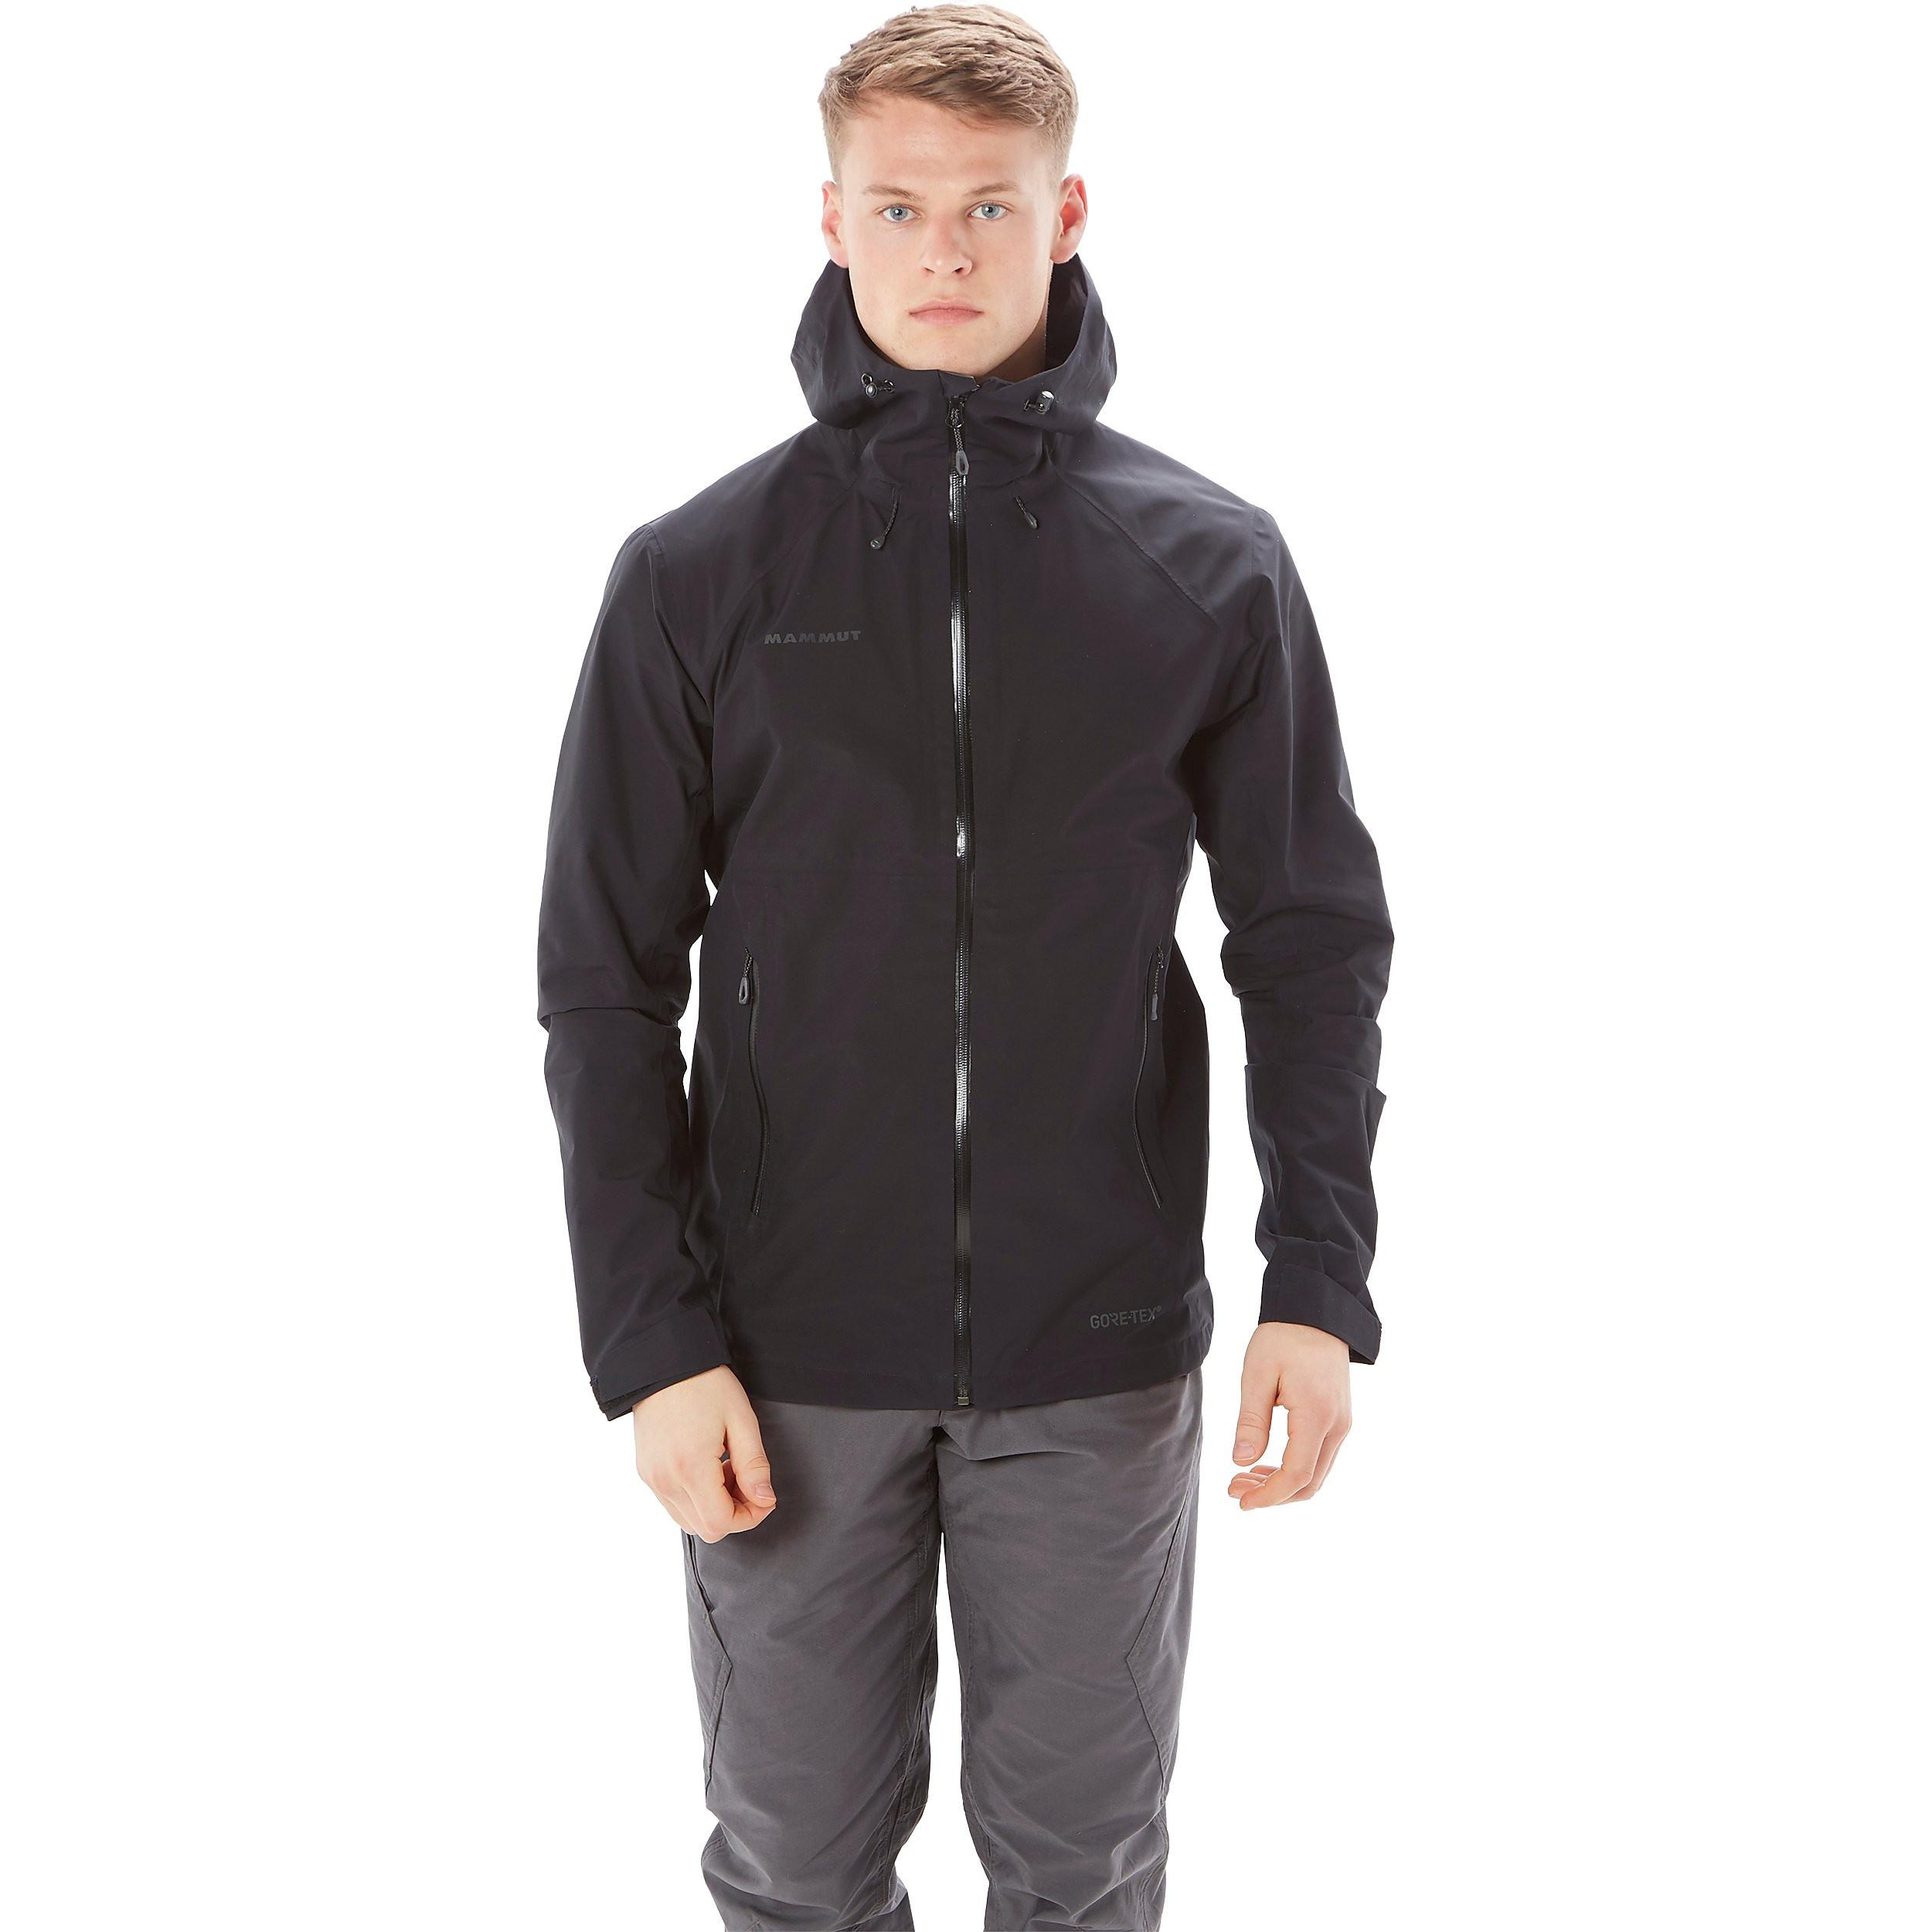 Mammut Convey Hooded Men's Jacket